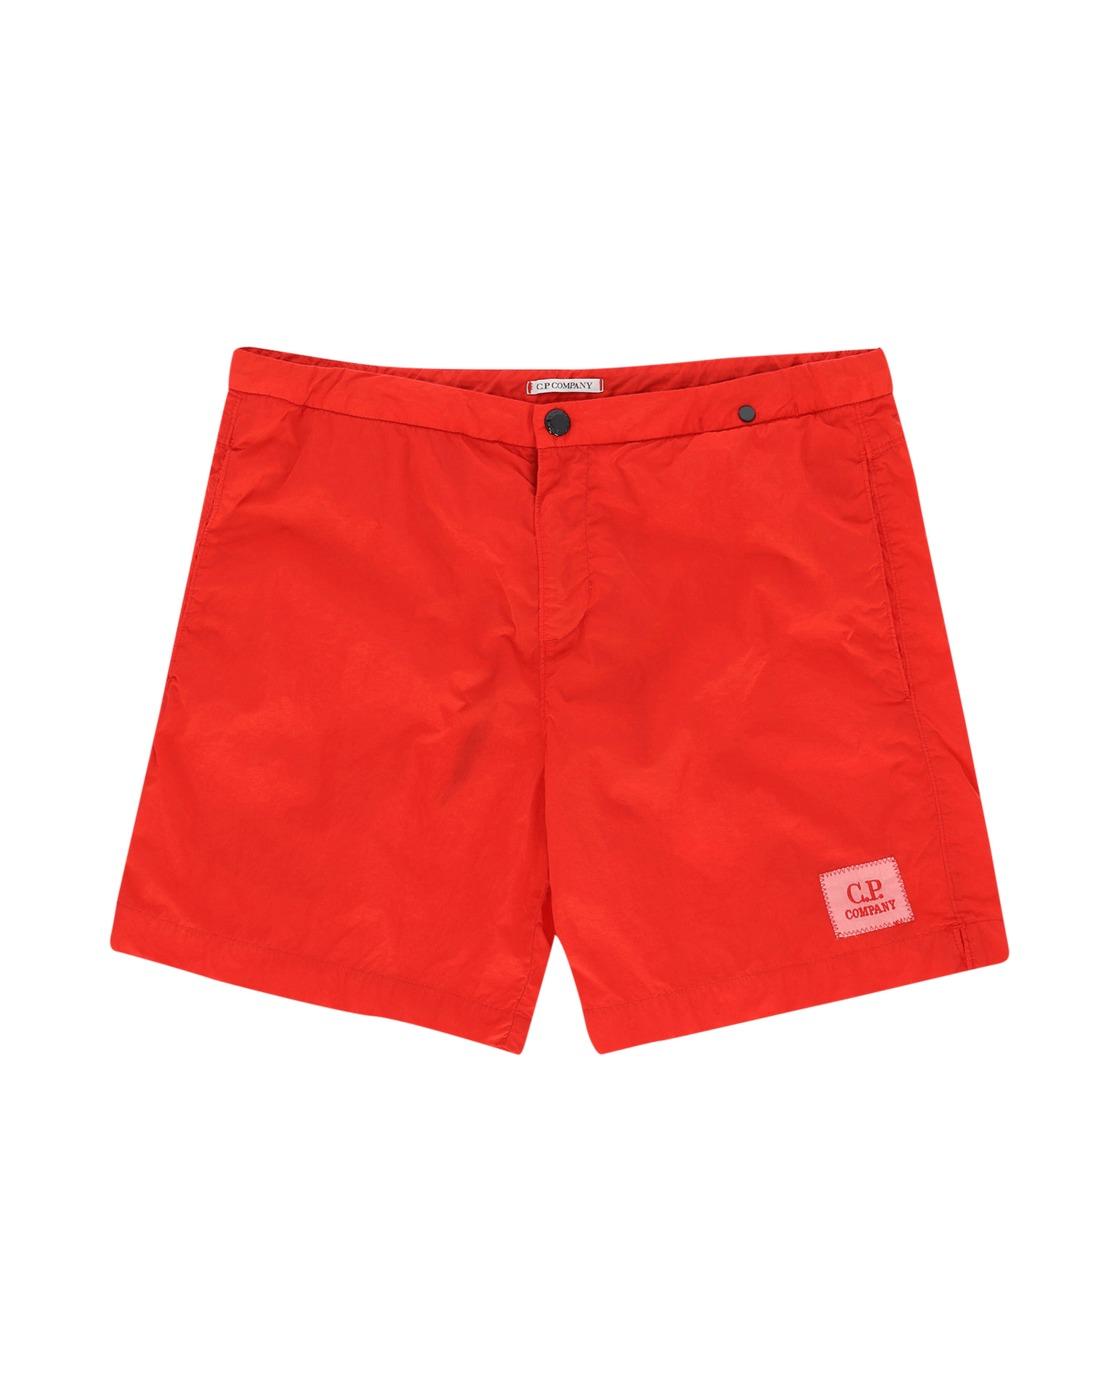 C.P. Company Beachwear Boxer High Risk Red